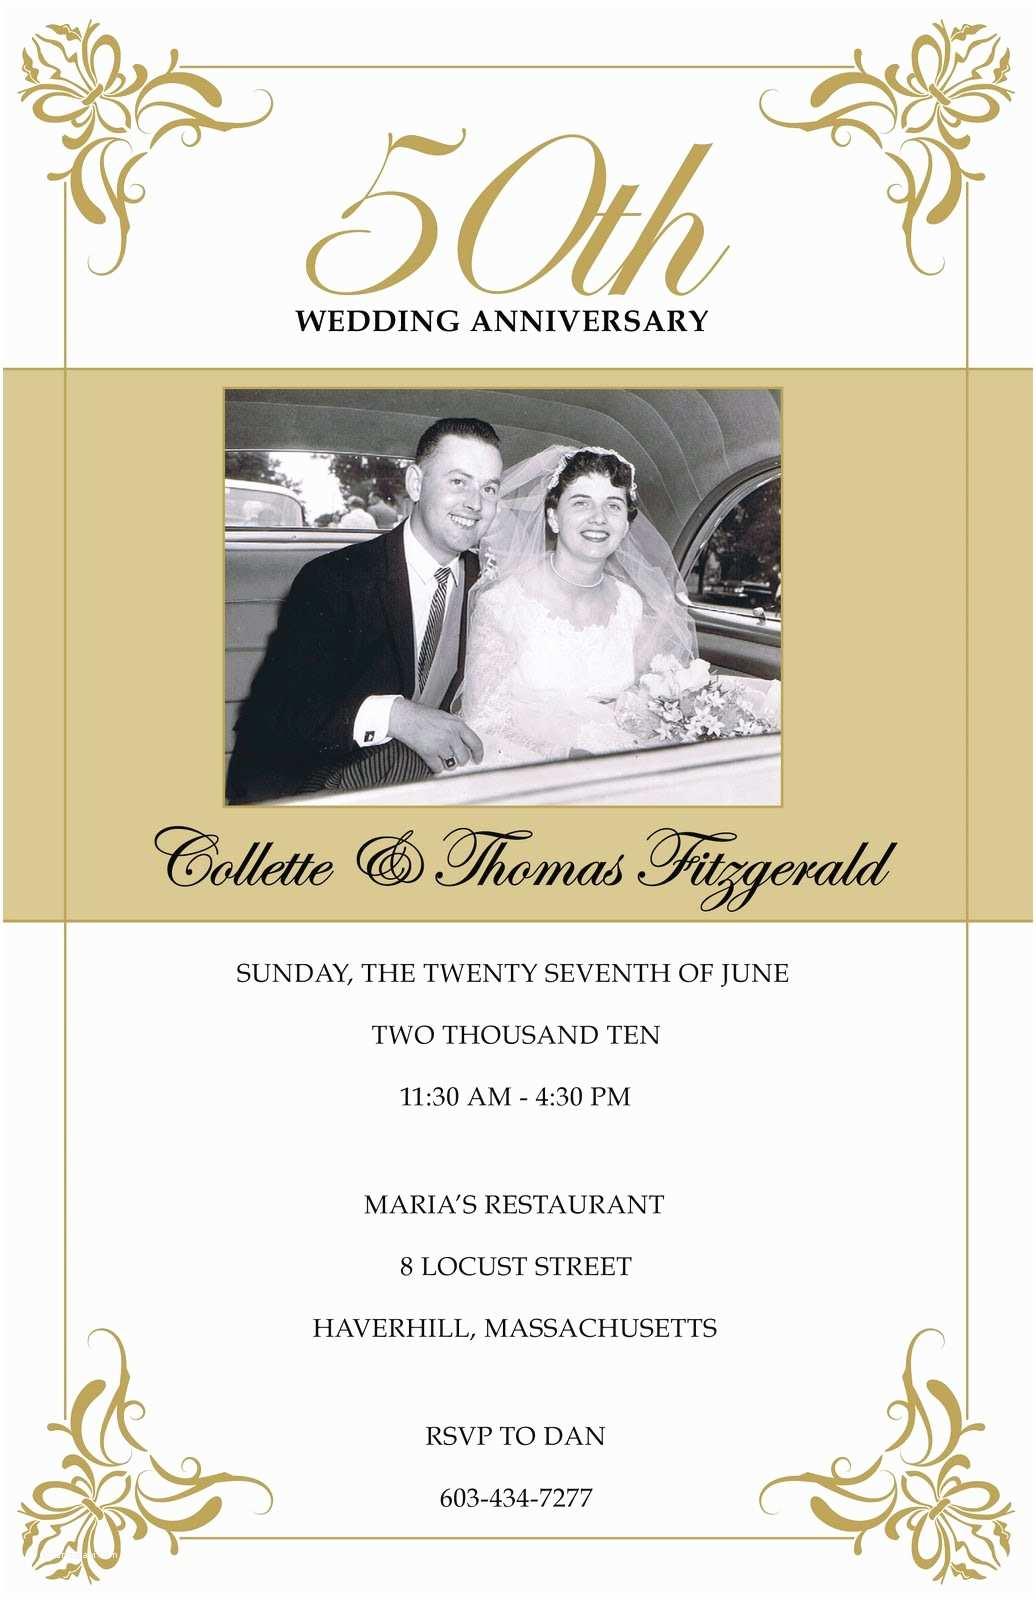 50th Wedding Invitations Annagraham Design 50th Anniversary